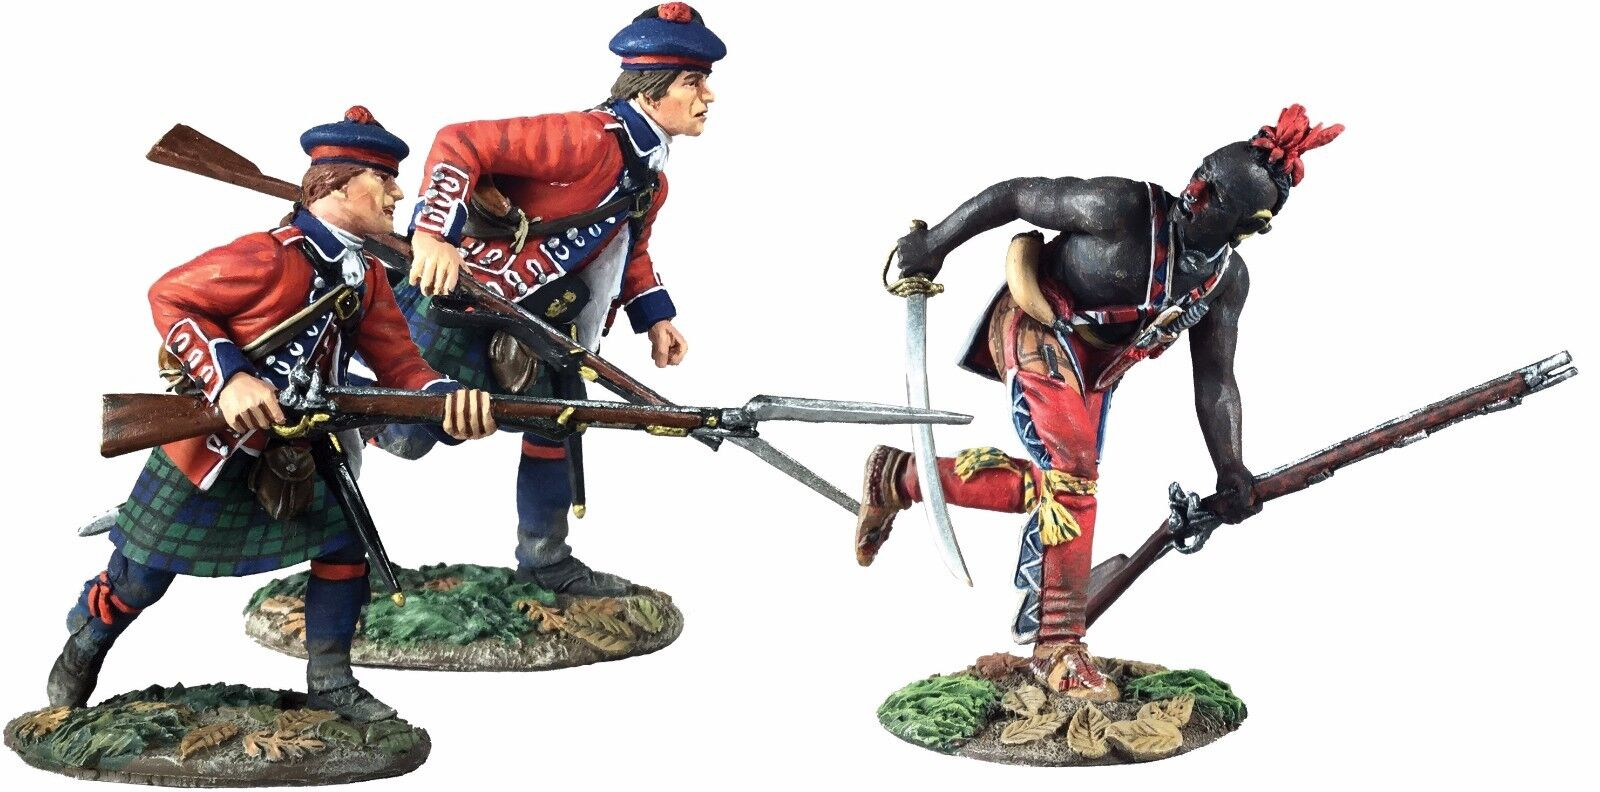 BRITAINS BRITAINS BRITAINS AMERICAN REVOLUTIONARY WAR 16039 BRUSHY RUN SET MIB 3594a2